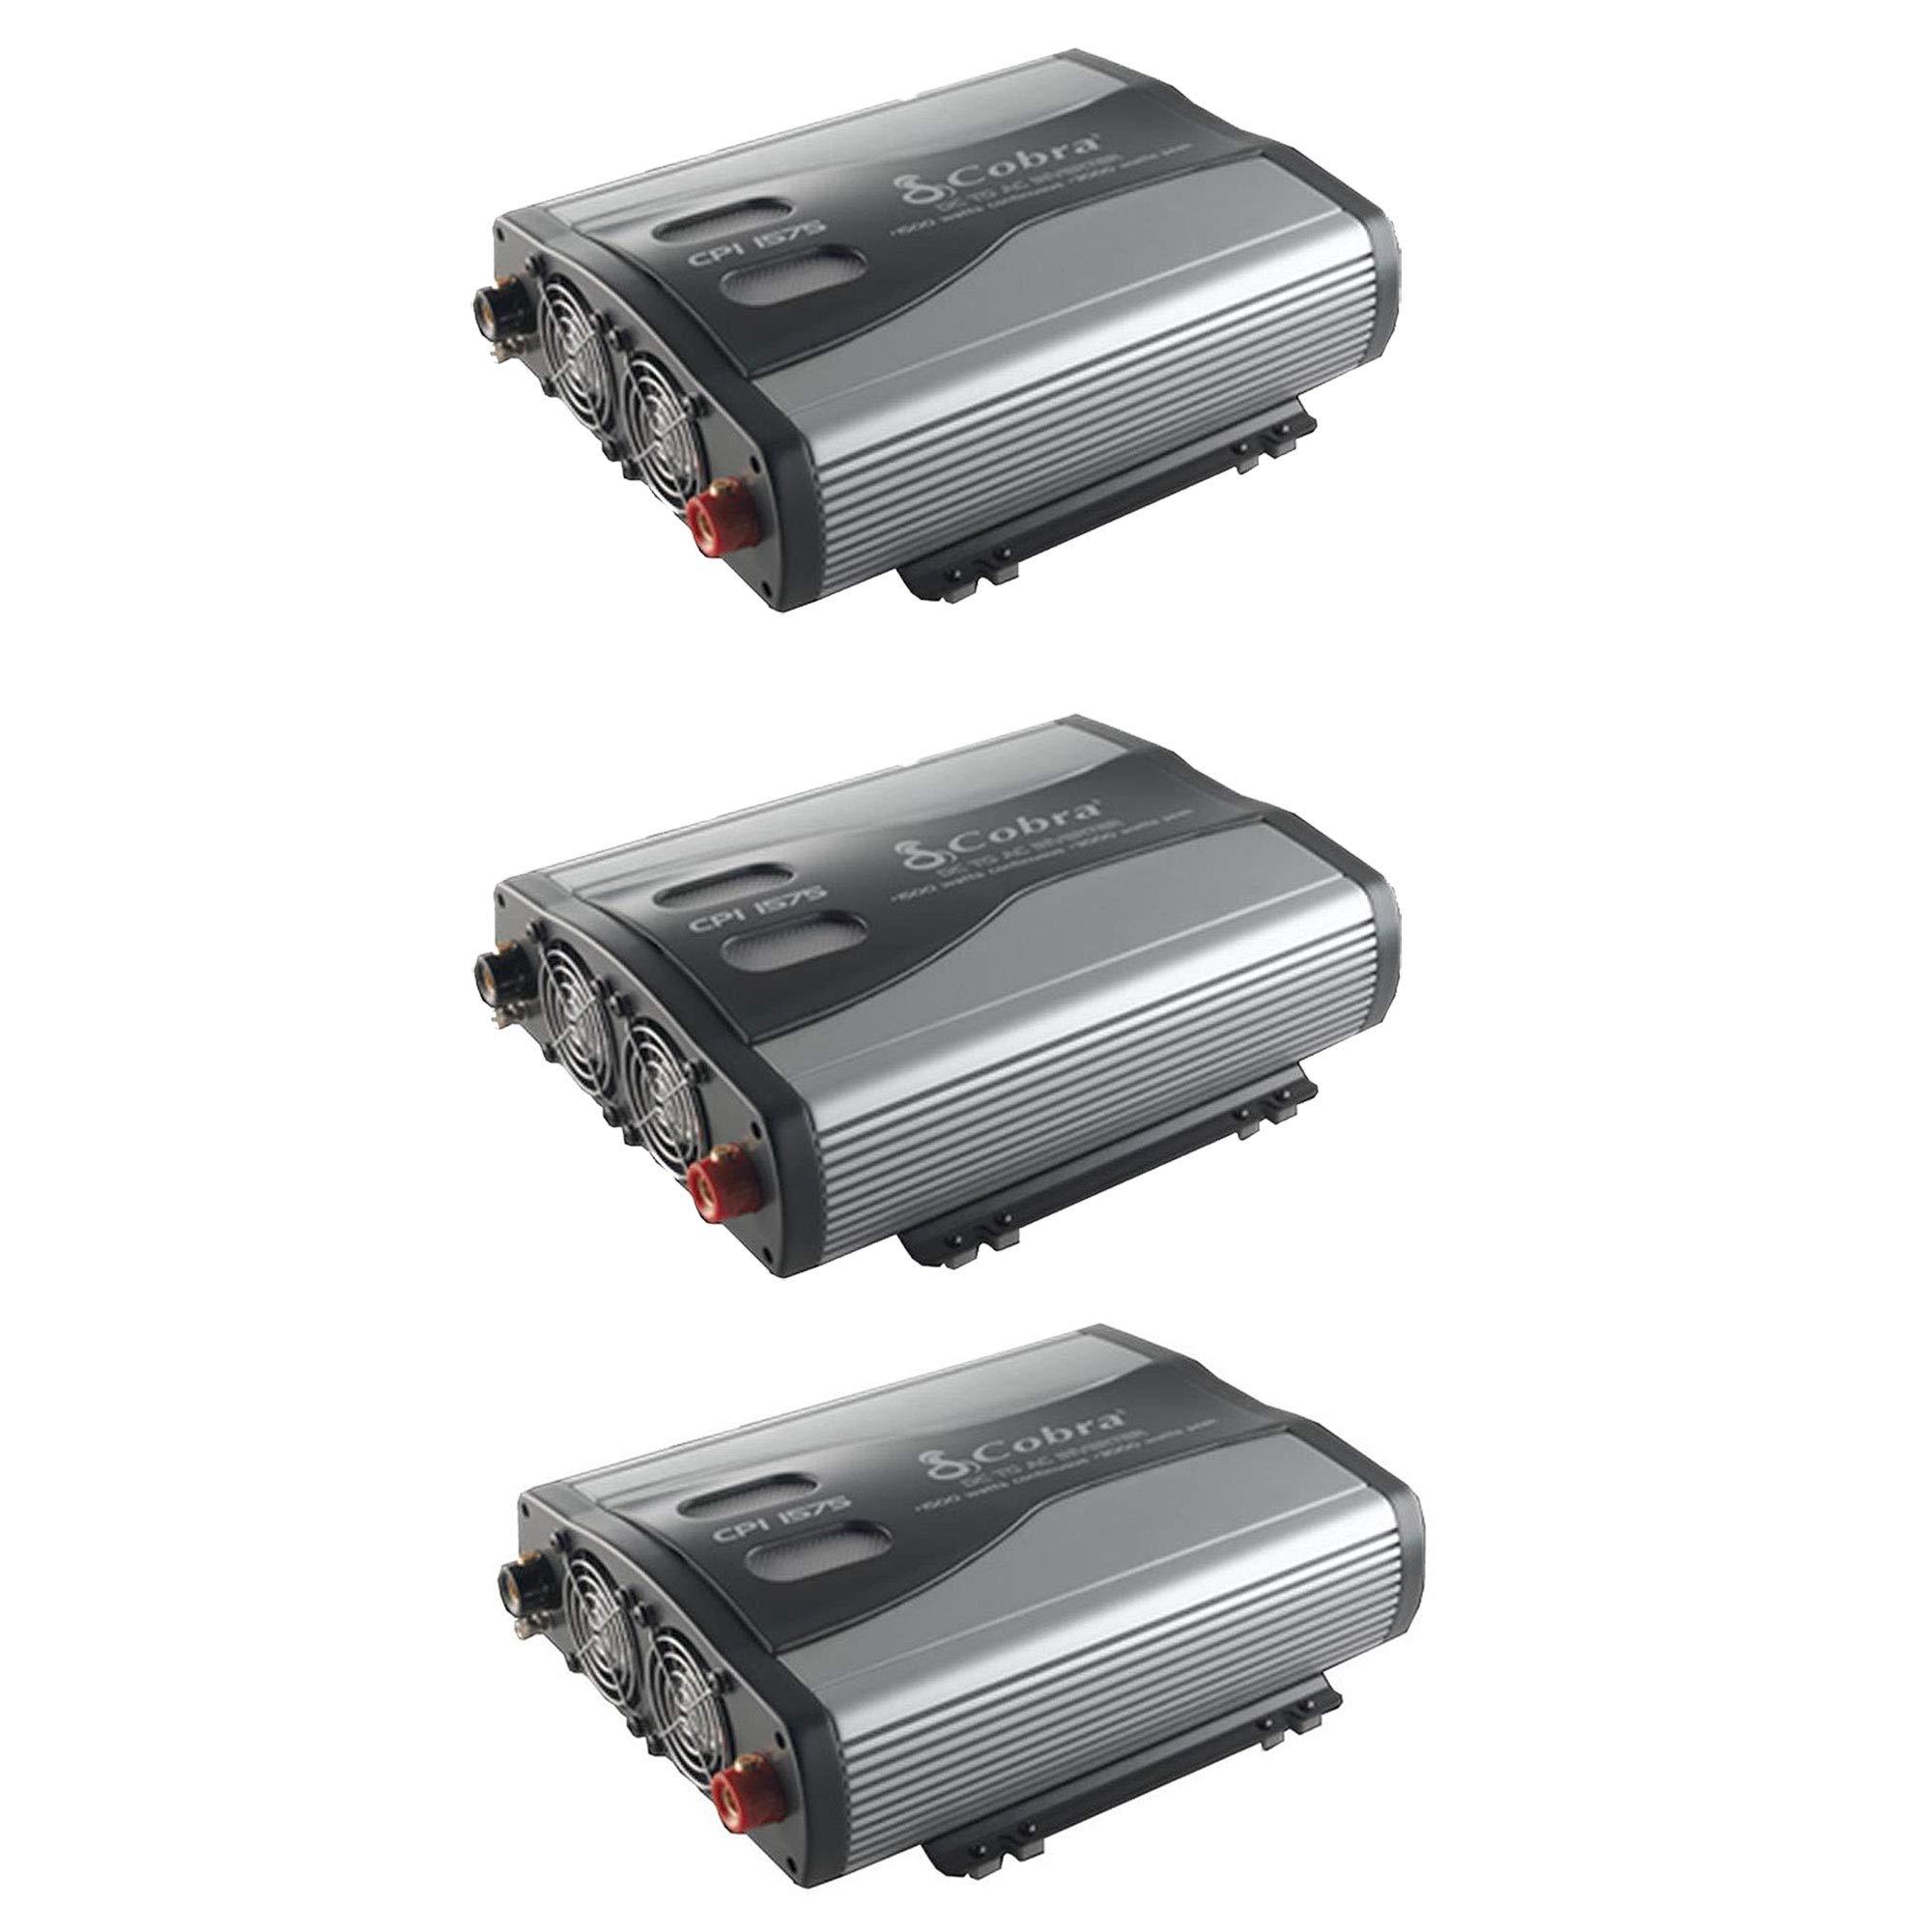 Cobra 1500W 12V DC to 120V AC Car Power Inverter, 3 Outlets and USB (3 Pack)